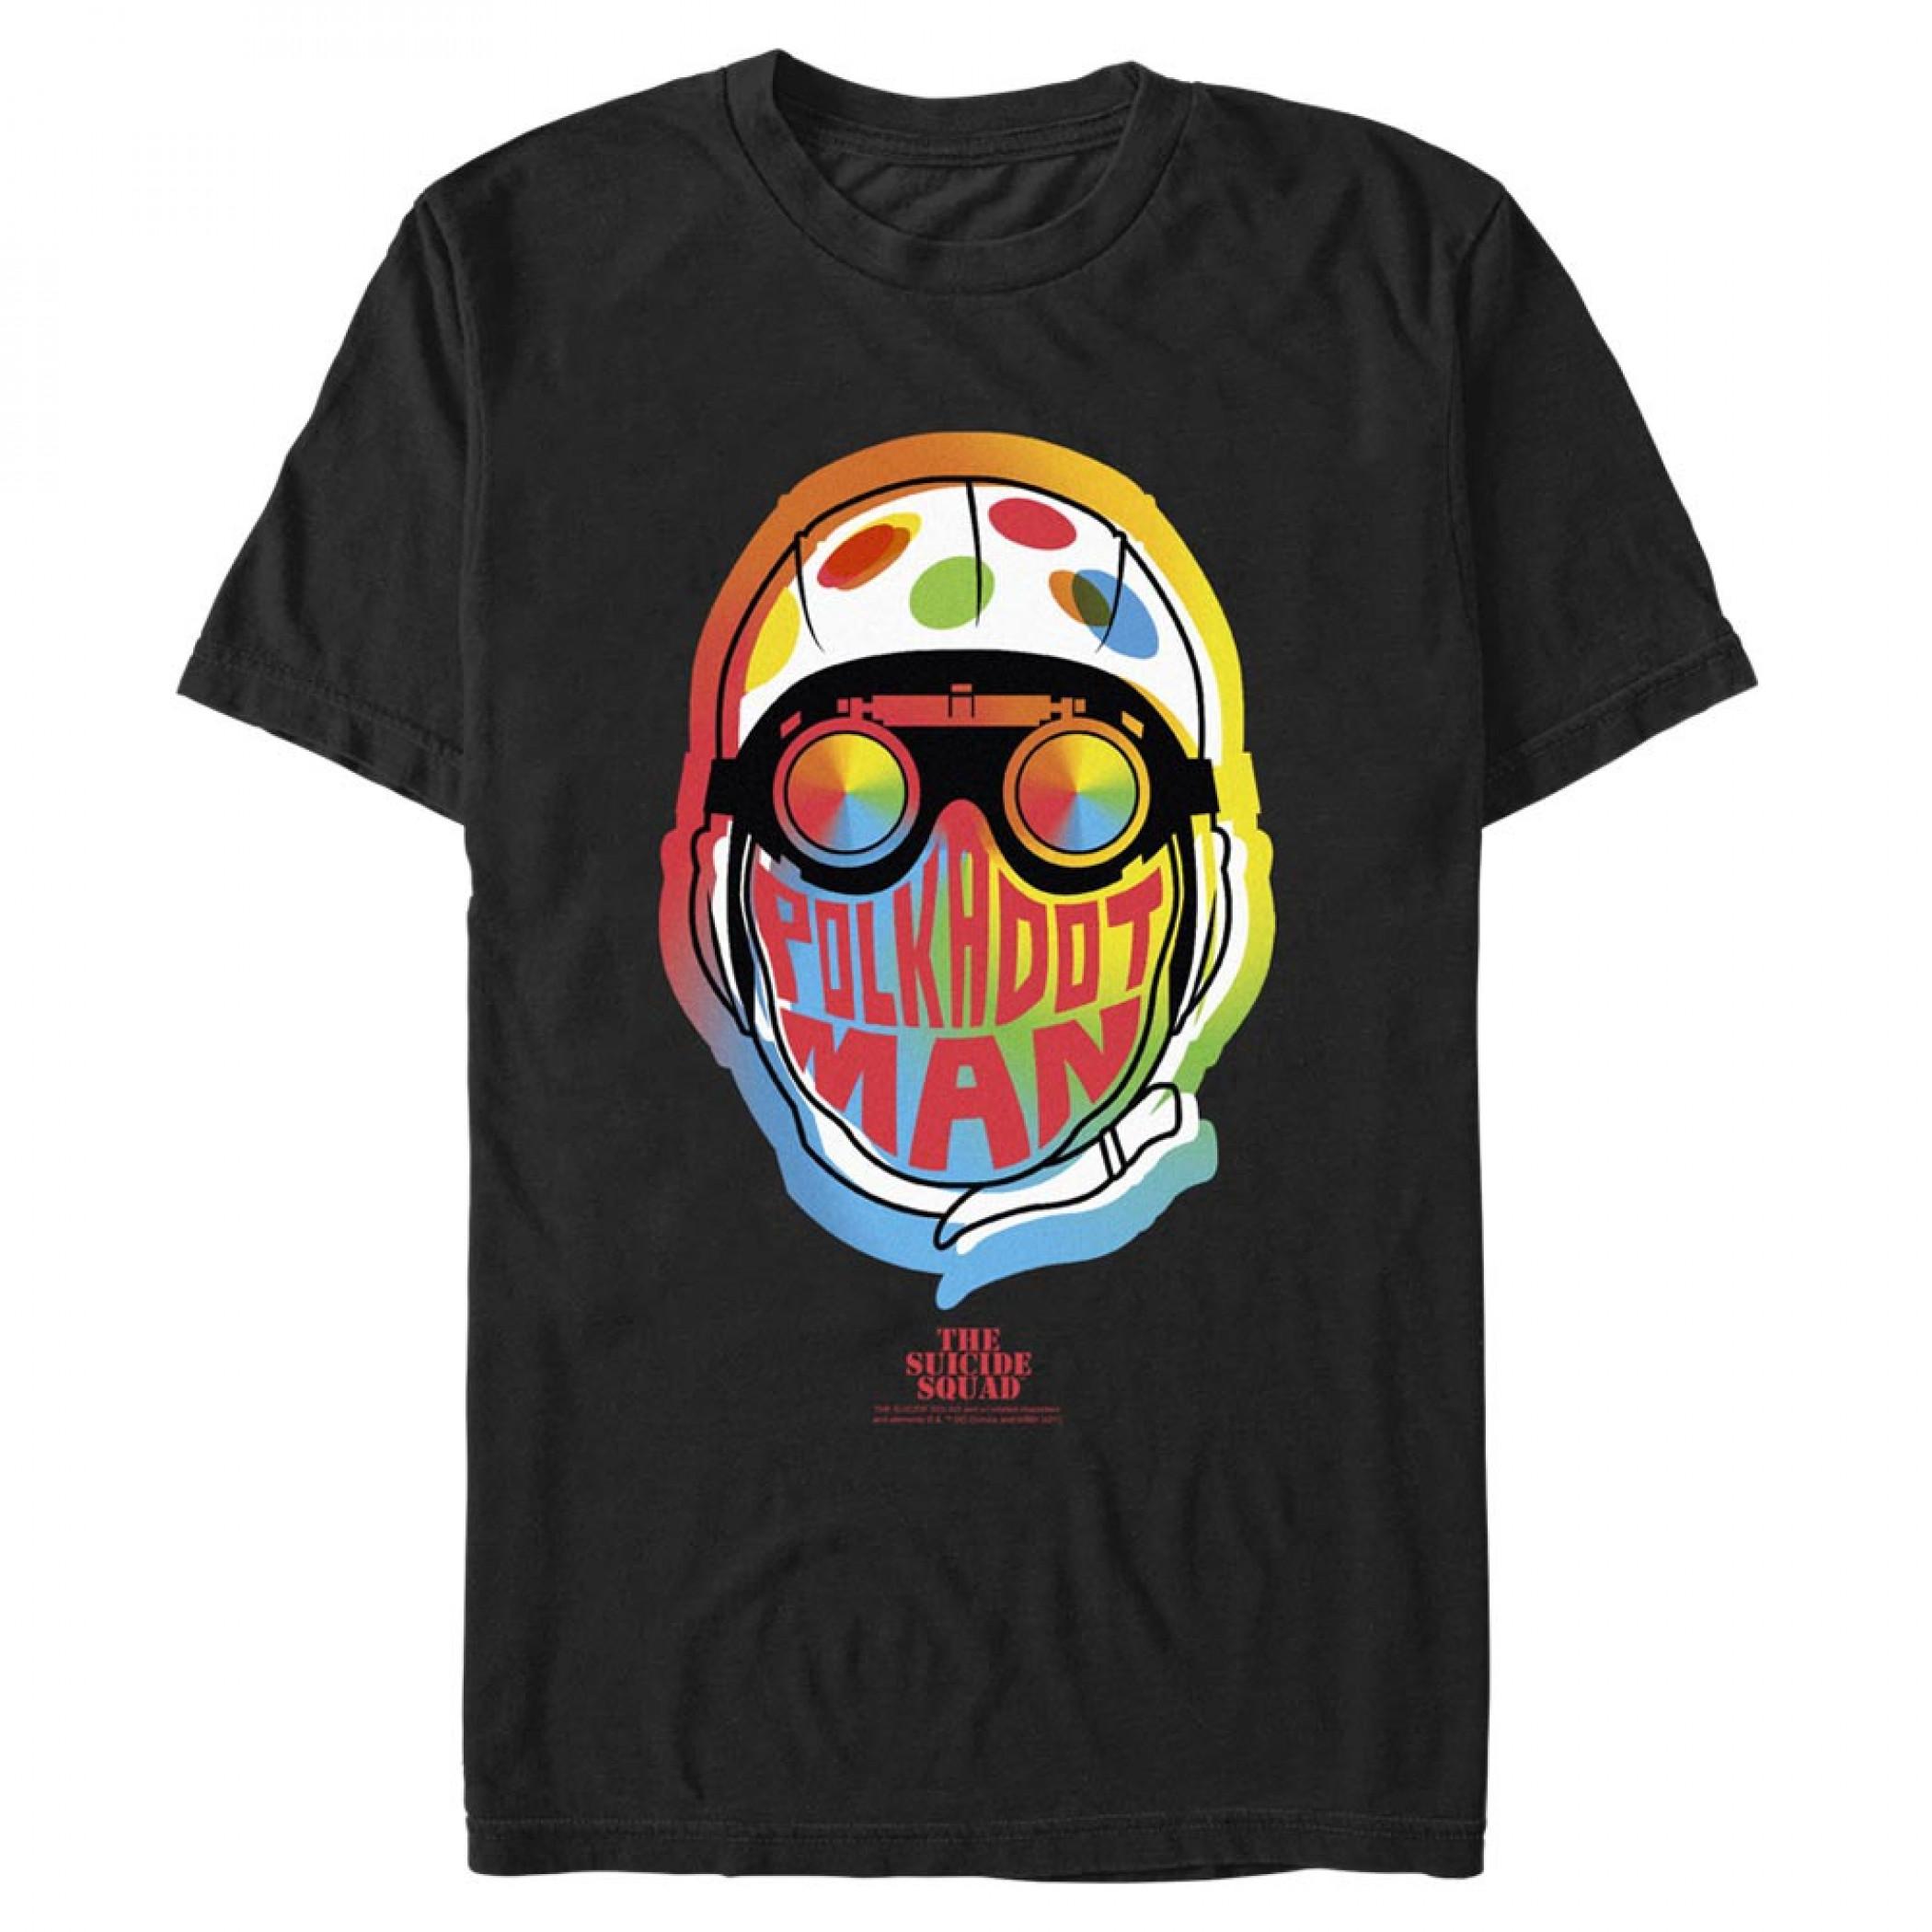 The Suicide Squad Polka-Dot Man Stylized Character Portrait Men's T-Shirt